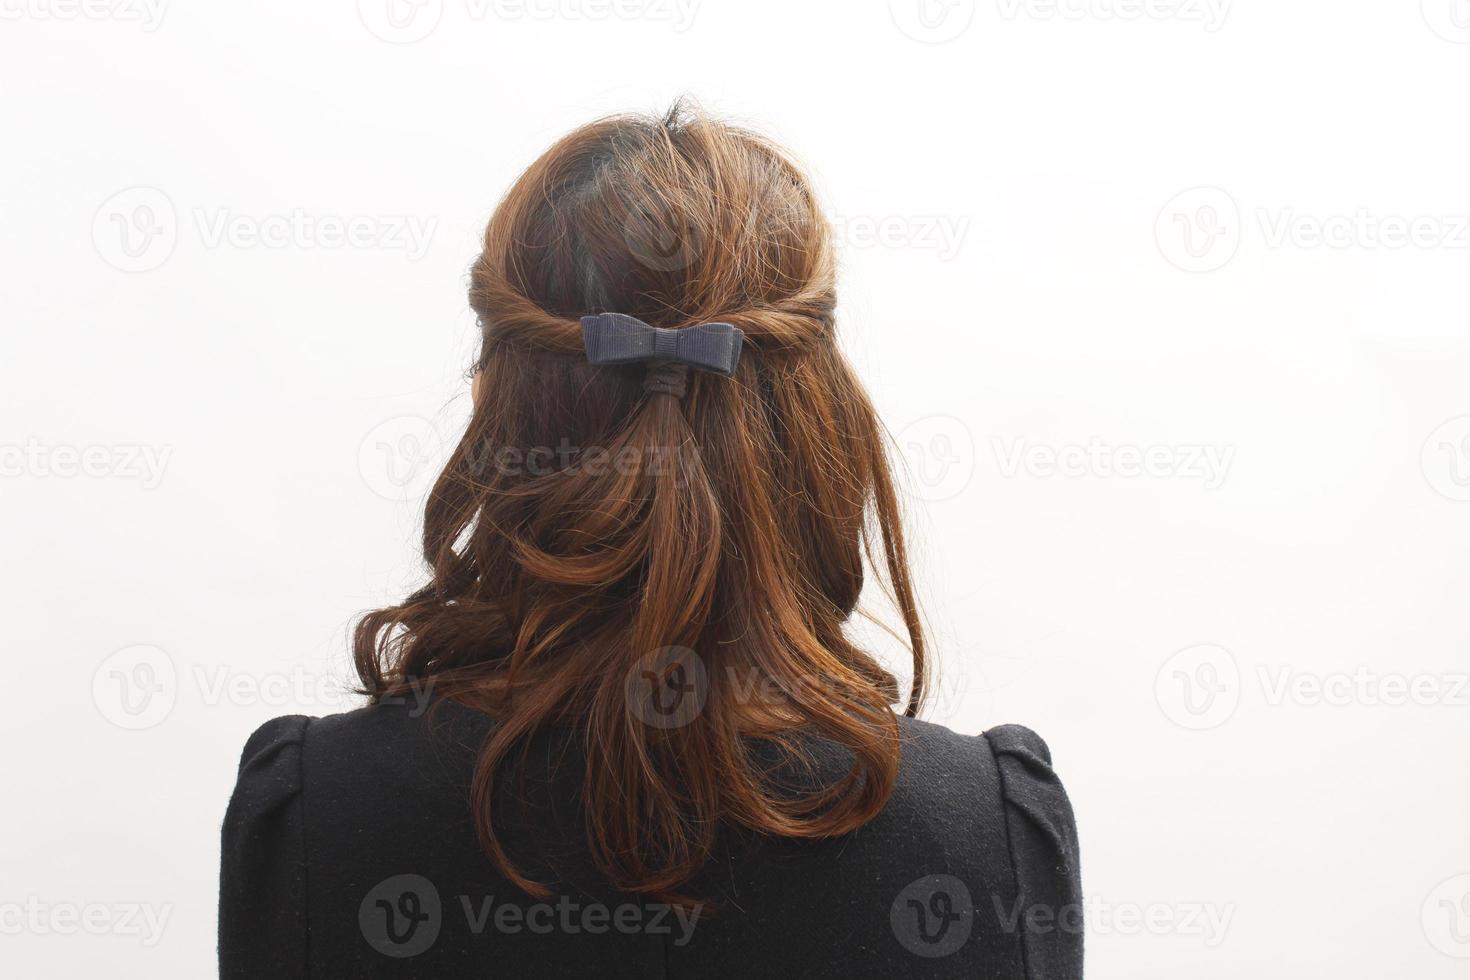 Female hair weave image photo